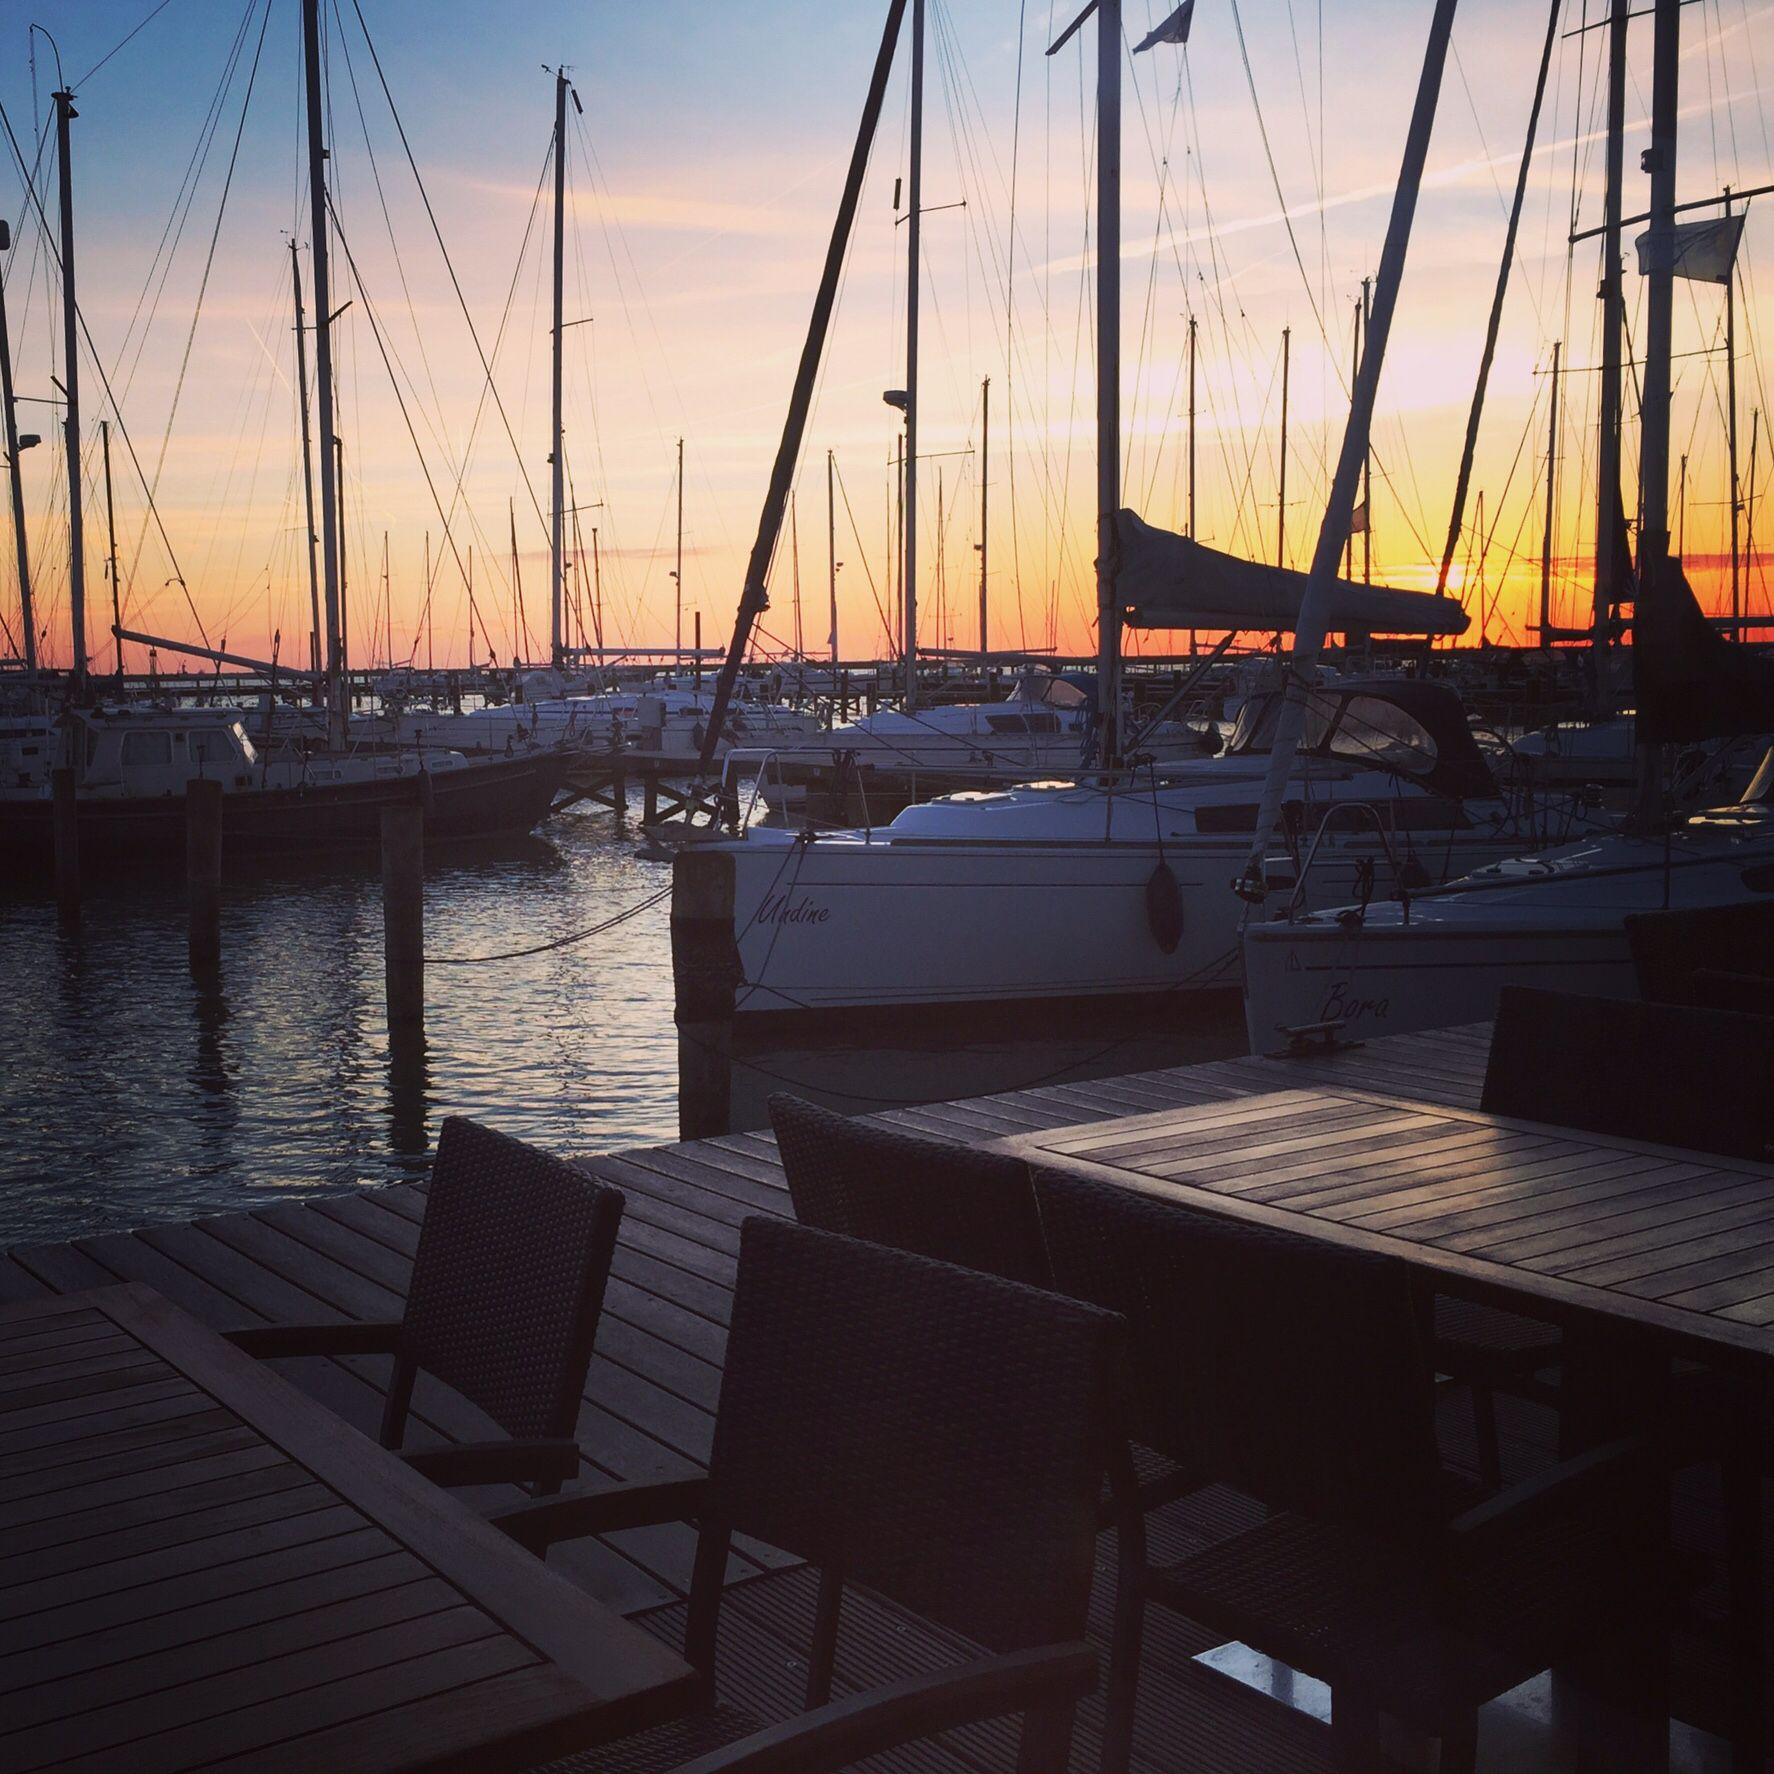 Yachtclub Lelystad Haven